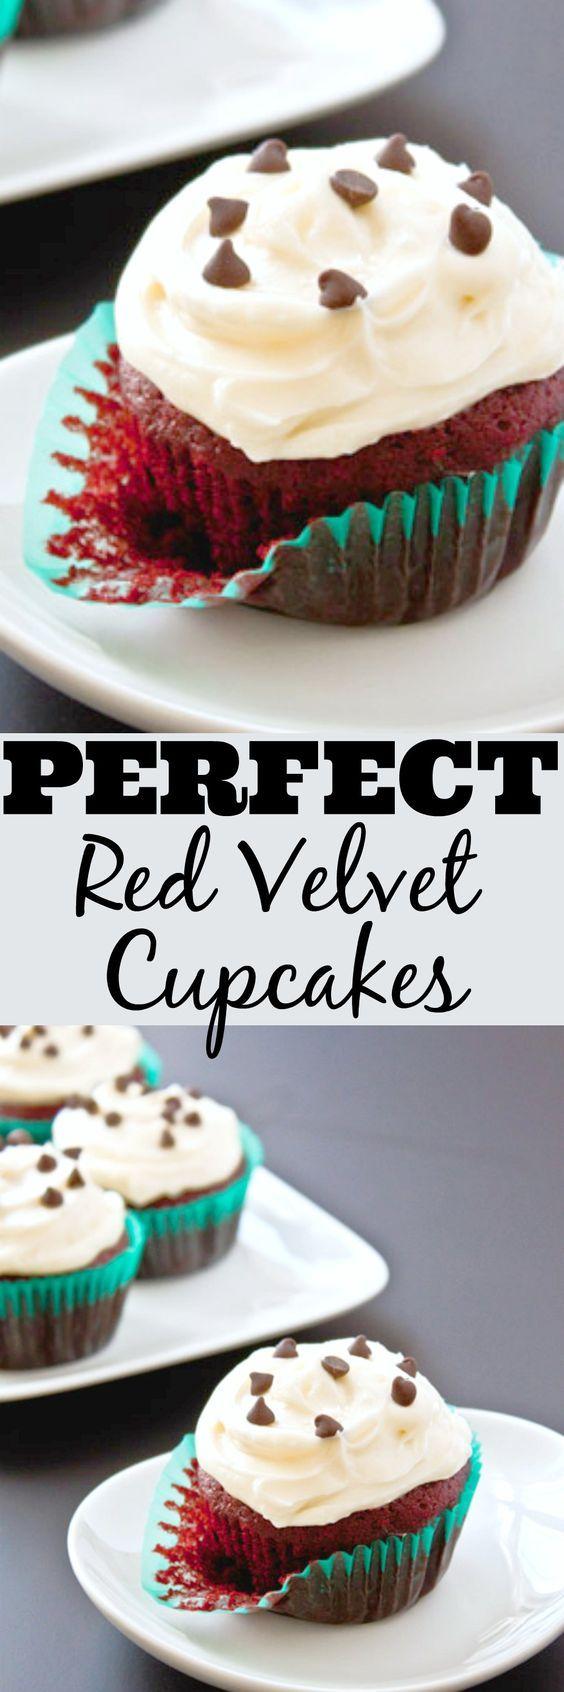 Small batch cupcake recipe. Recipe makes 4 red velvet cupcakes.